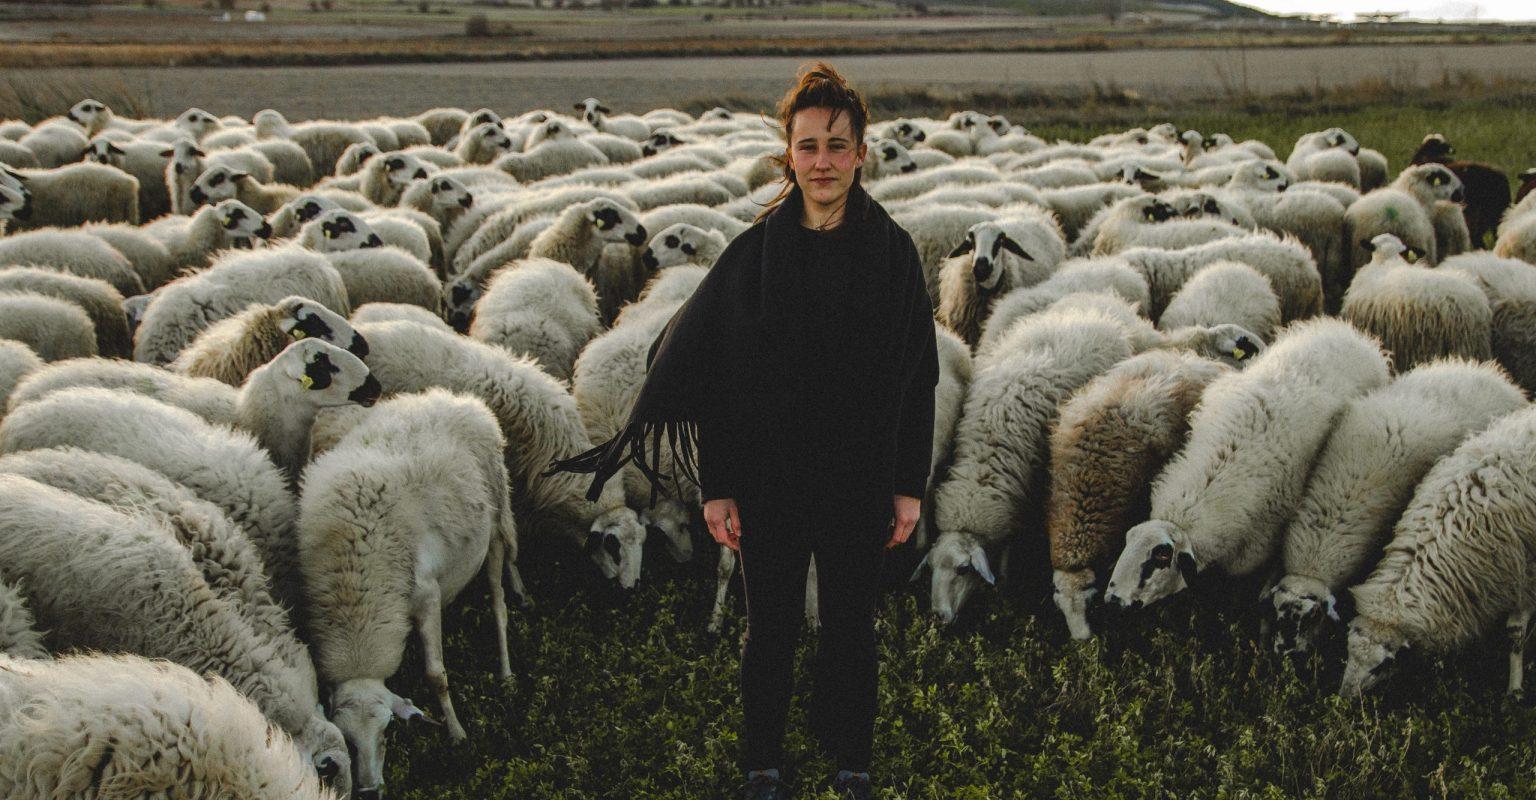 La Pastora marcela en el quijote feminismo castellano